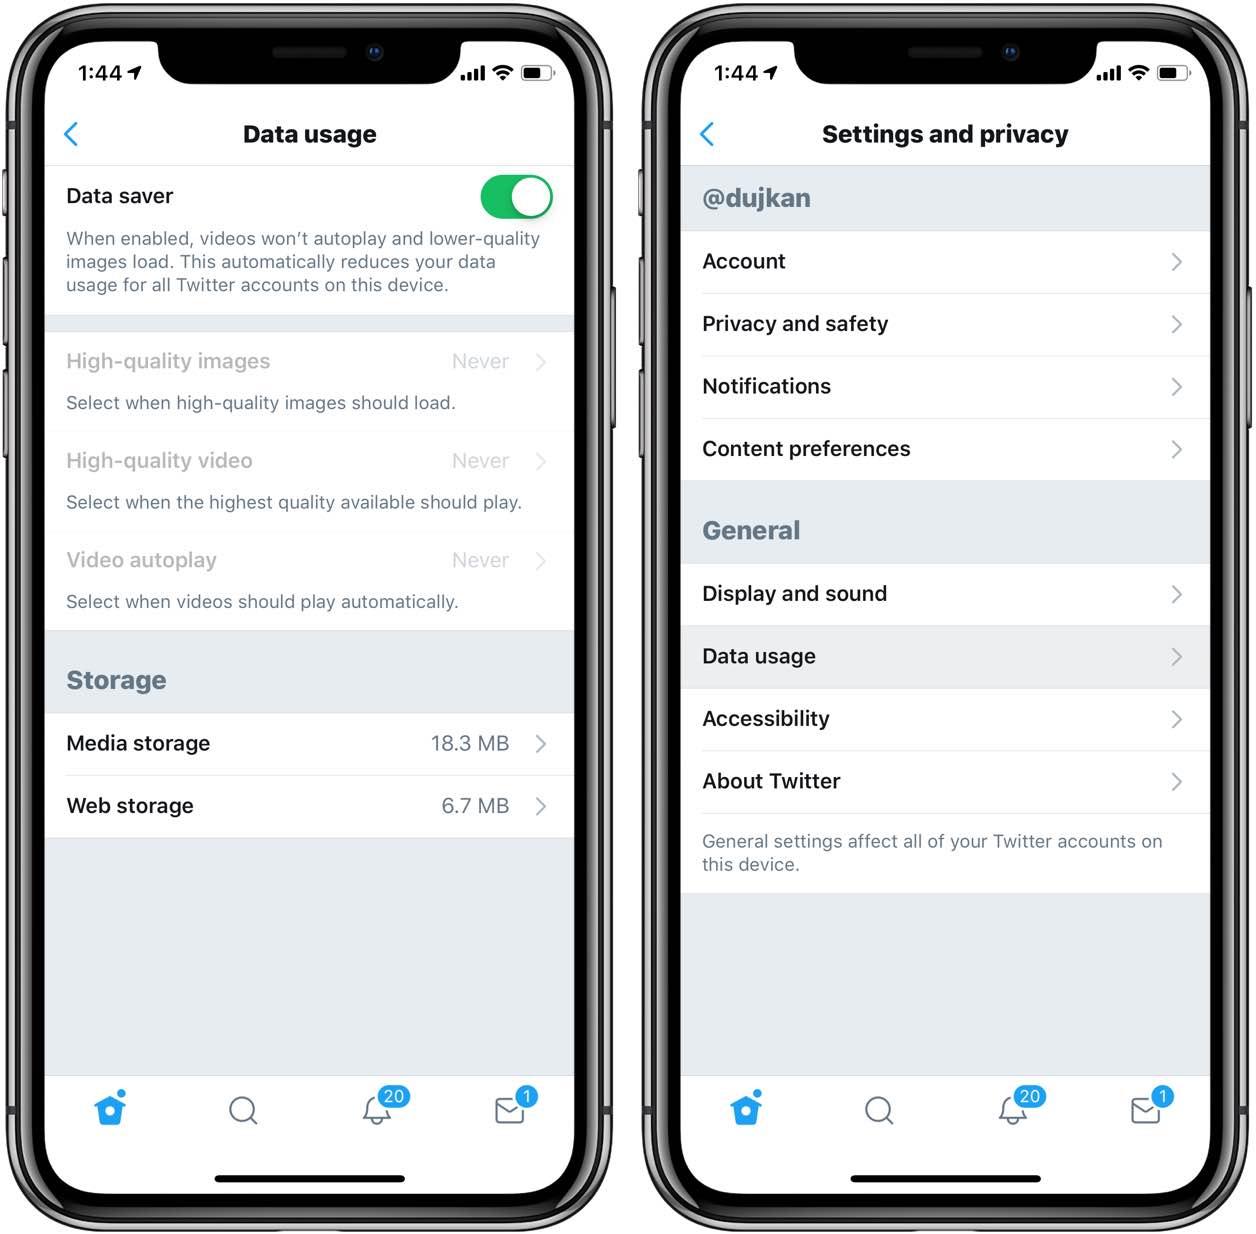 Twitter Data Saver settings on iPhone